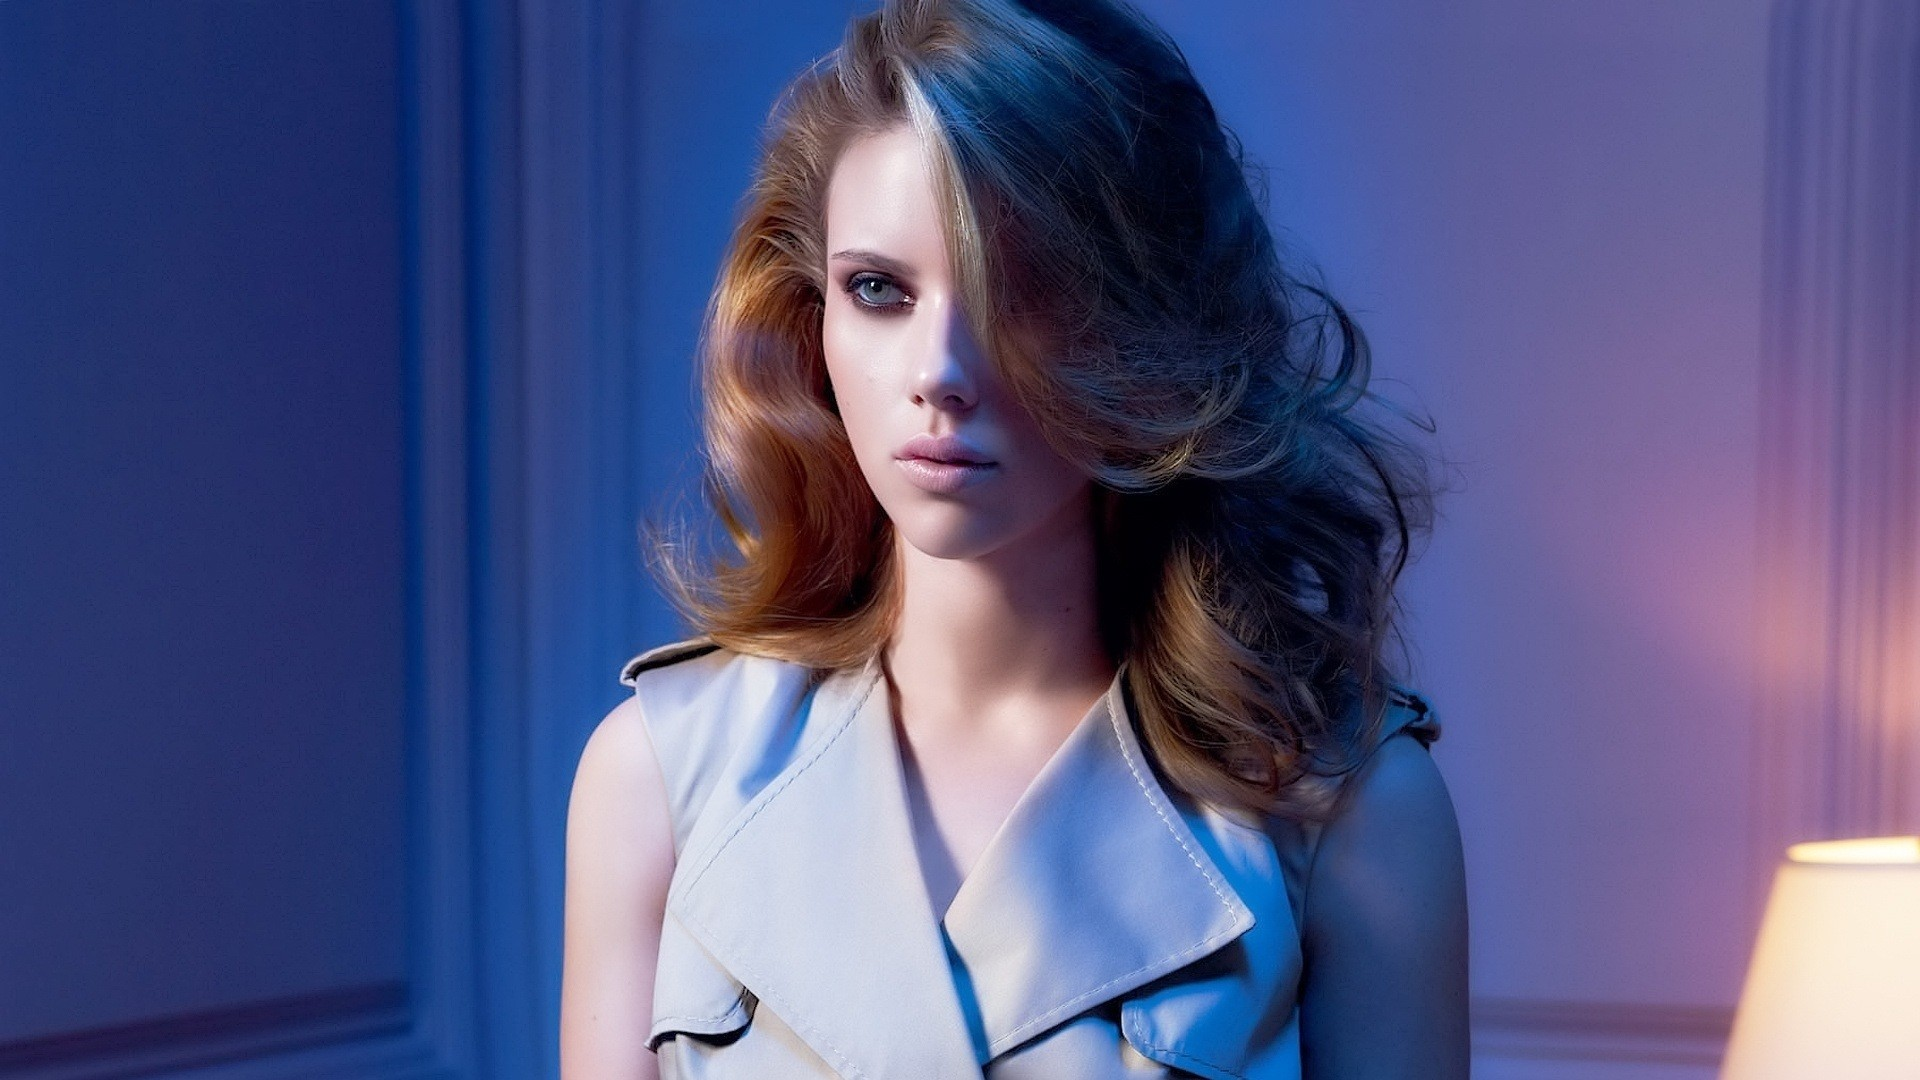 Scarlett Johansson wallpaper photo